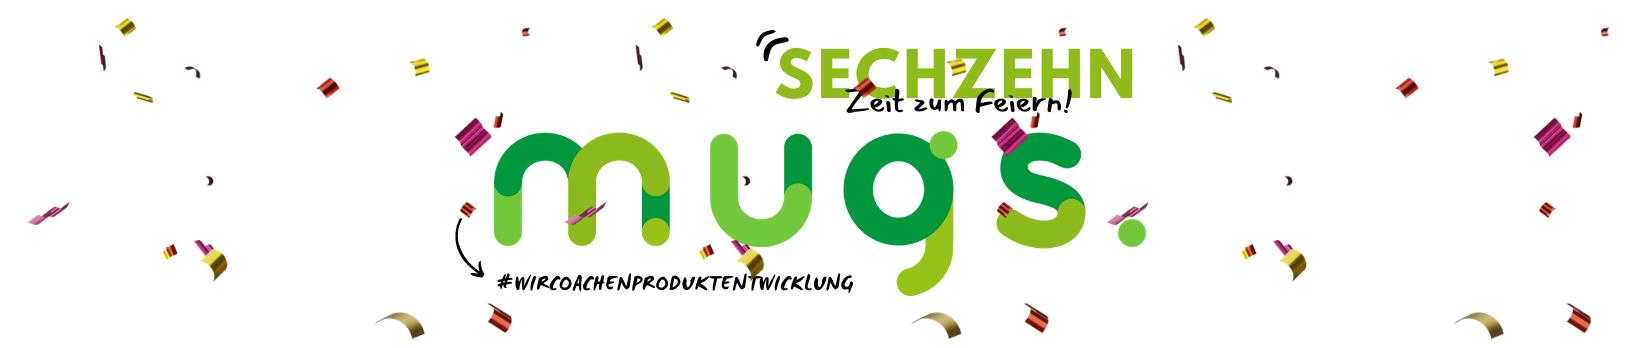 16. Juliäum mugs GmbH